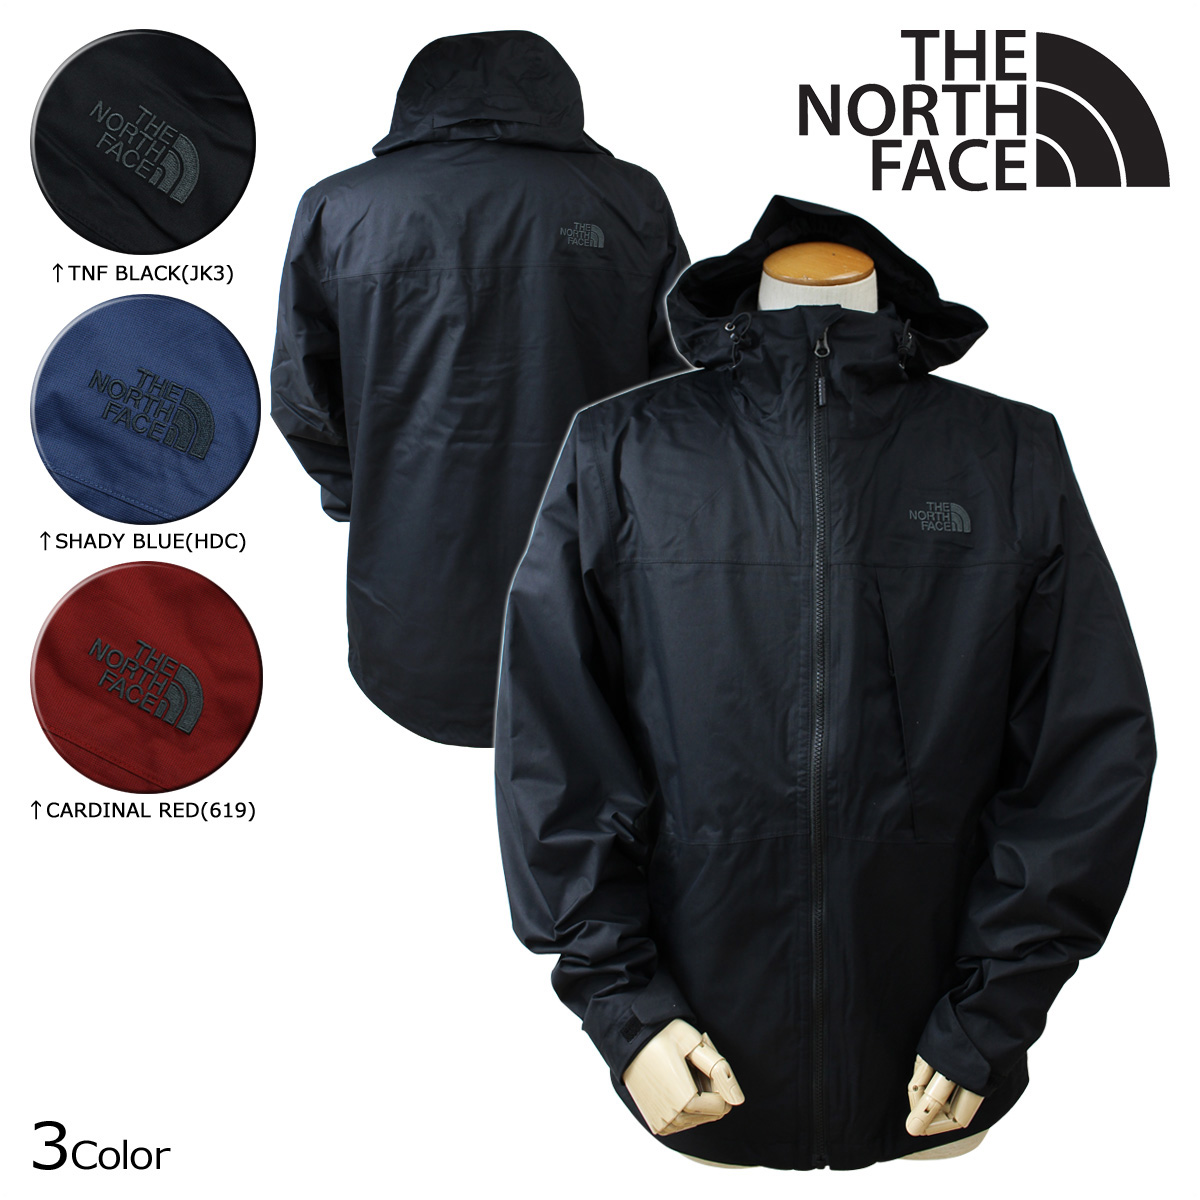 THE NORTH FACE ノースフェイス ジャケット シェルジャケット フリース MEN'S ARROWOOD TRICLIMATE JACKET NF0A2TCN メンズ 【CLEARANCE】